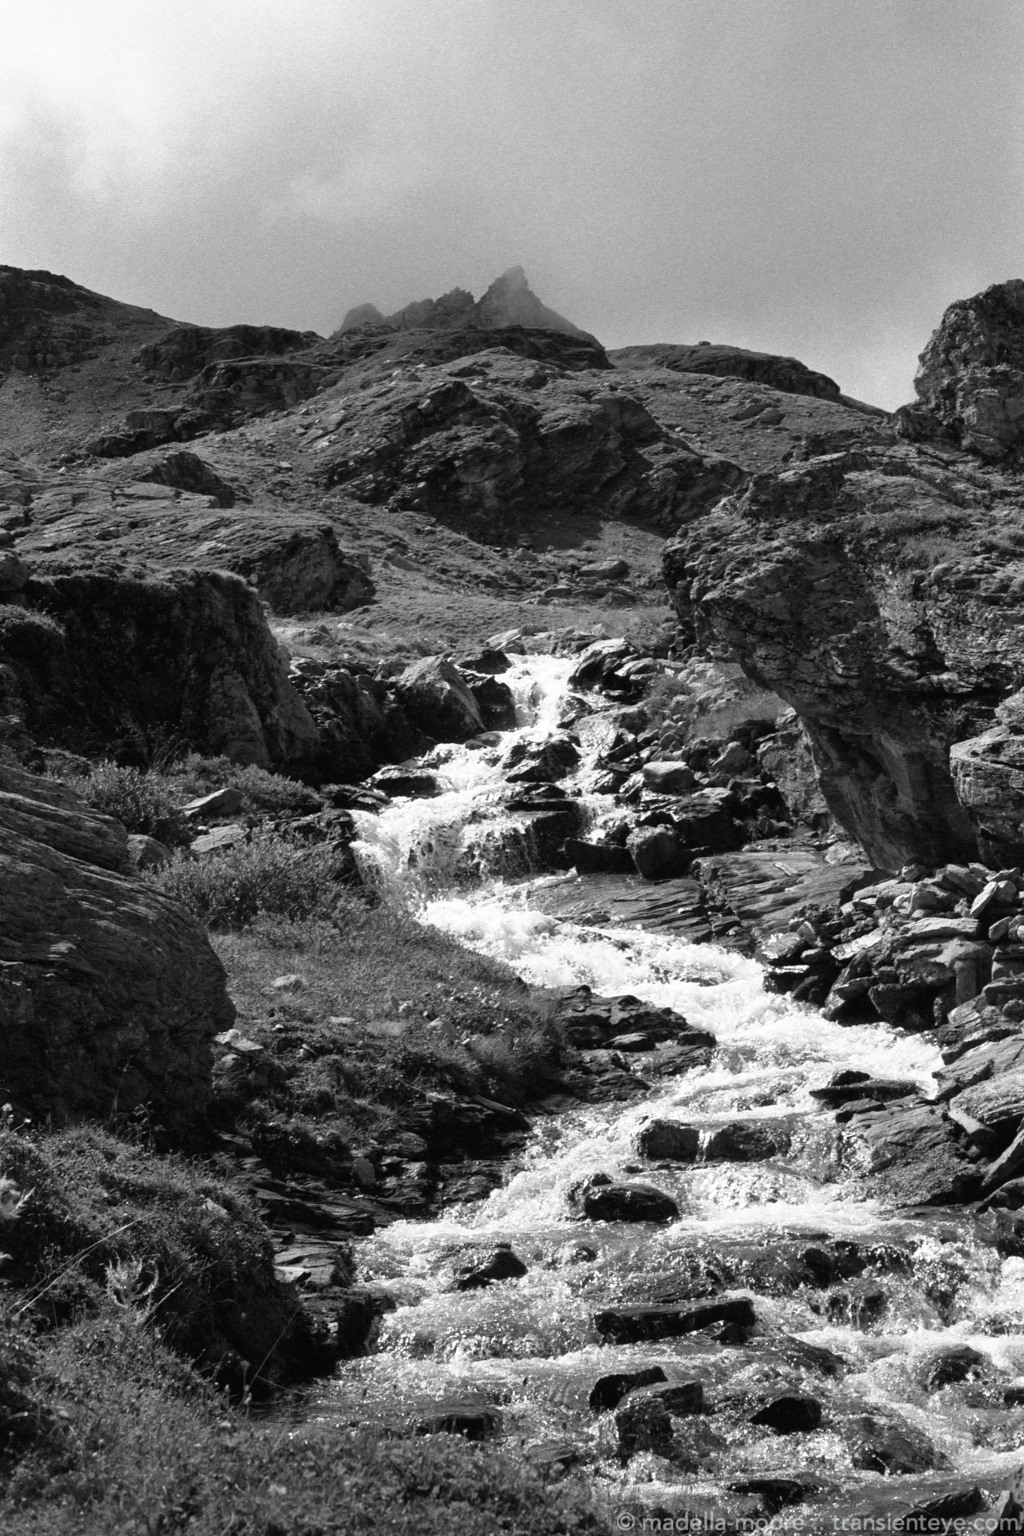 Mountain Stream, Switzerland. Ilford Delta 100.